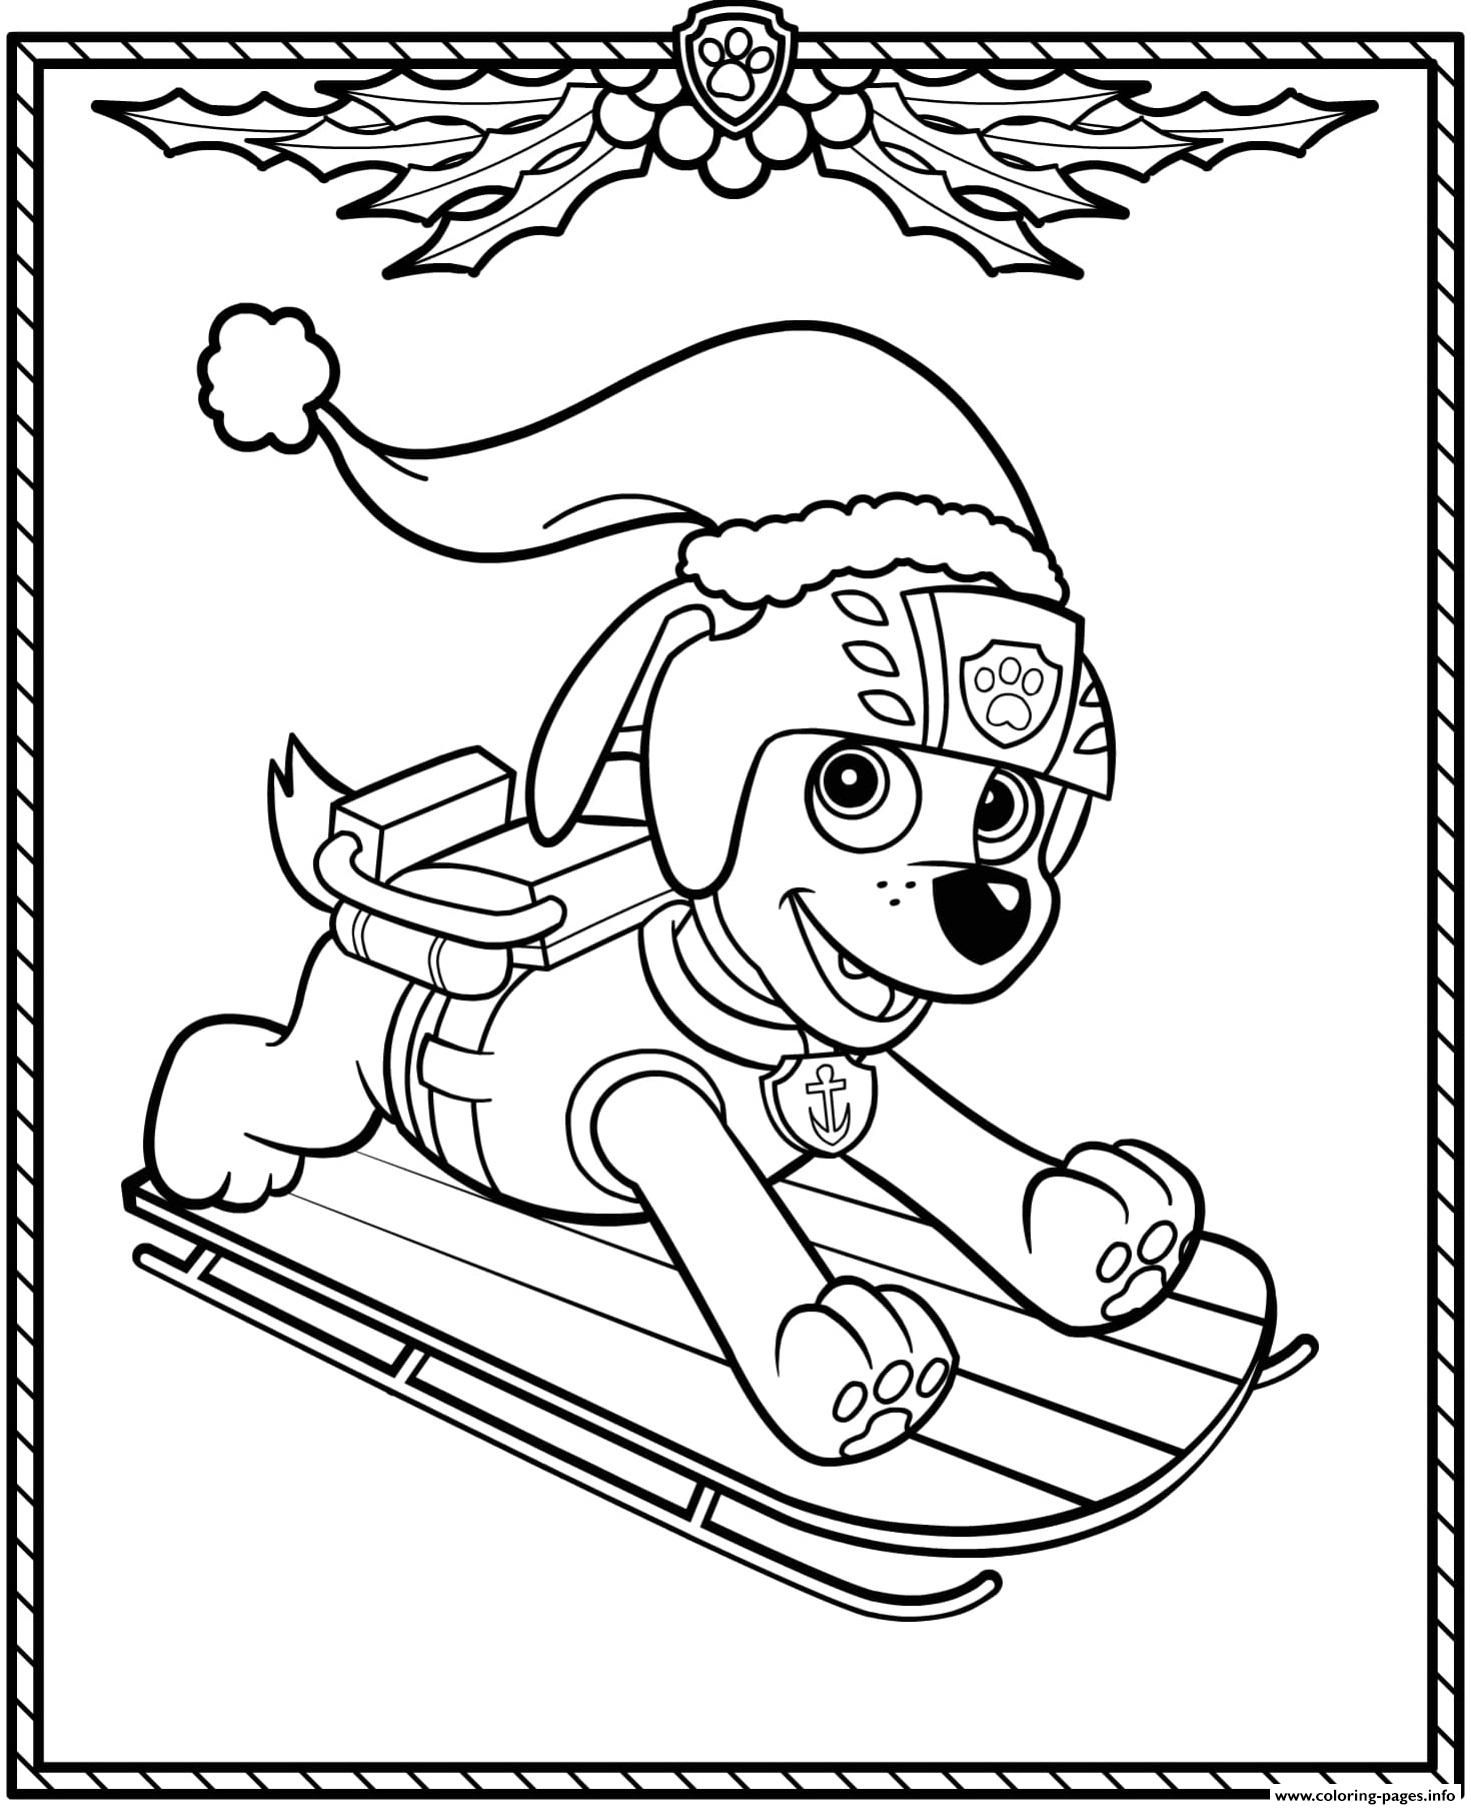 Print Paw Patrol Holiday Christmas Zuma Coloring Pages Paw Patrol Coloring Paw Patrol Christmas Paw Patrol Coloring Pages